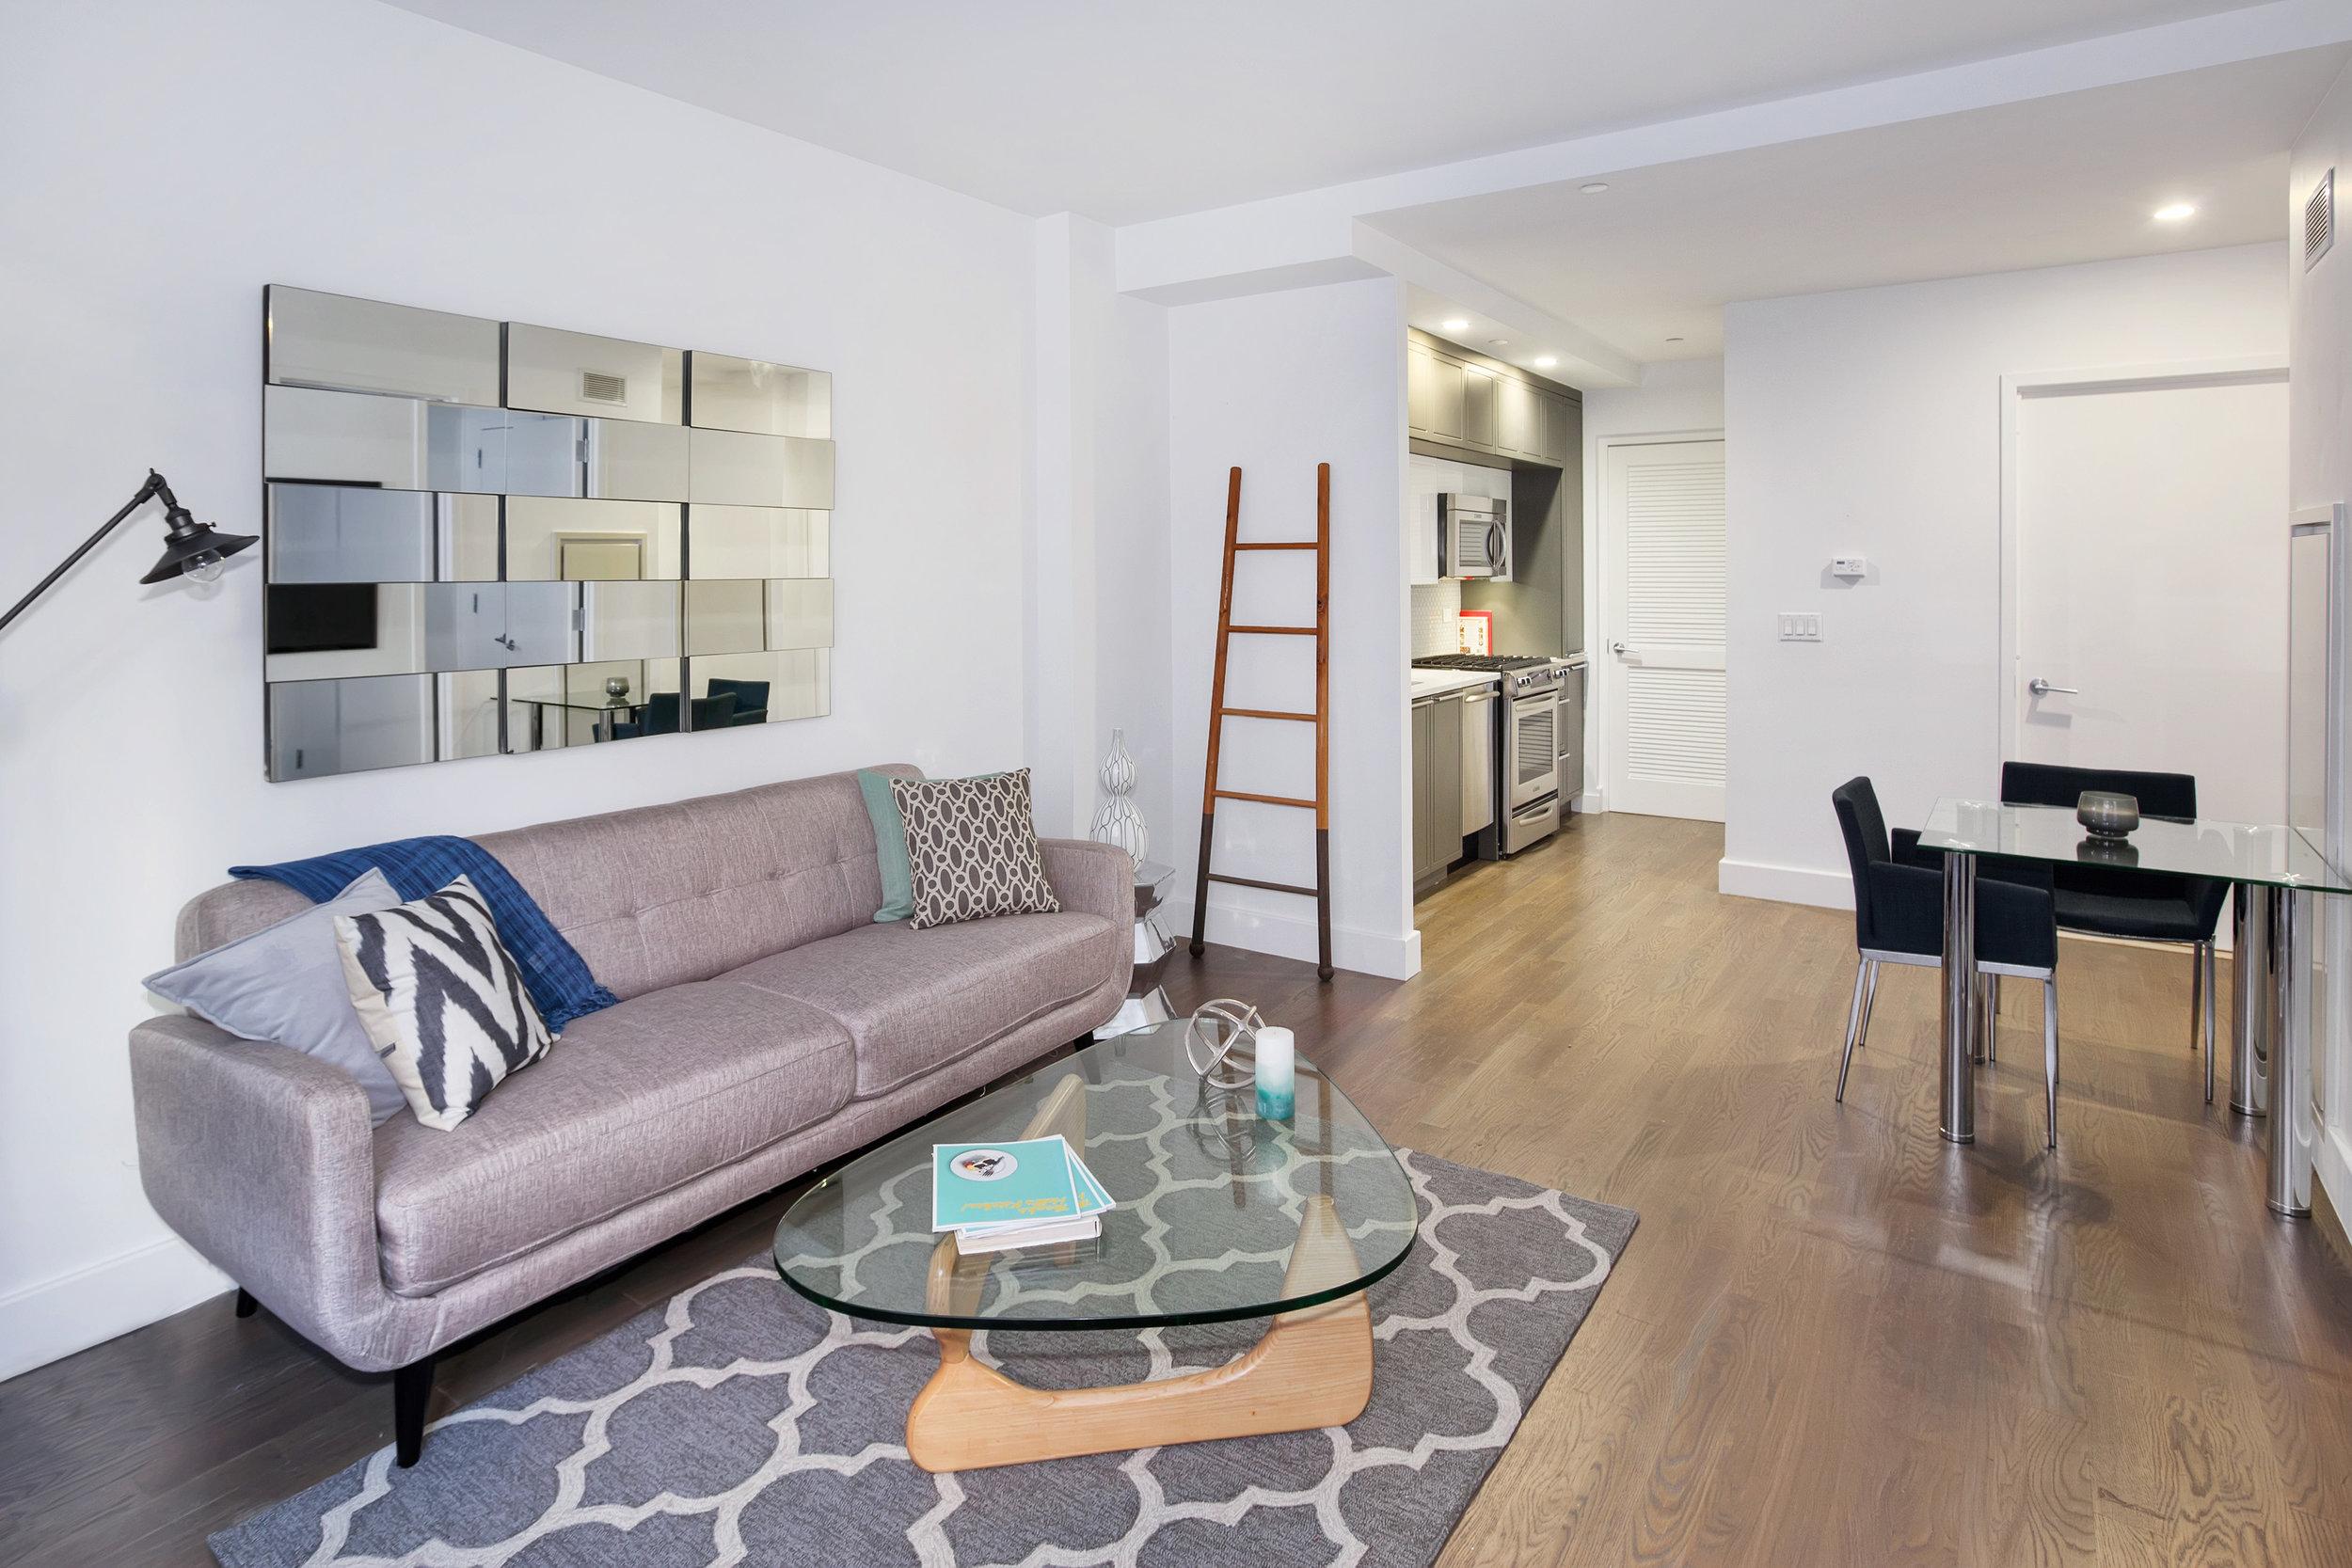 432 West 52nd Street, #2F - $995,000